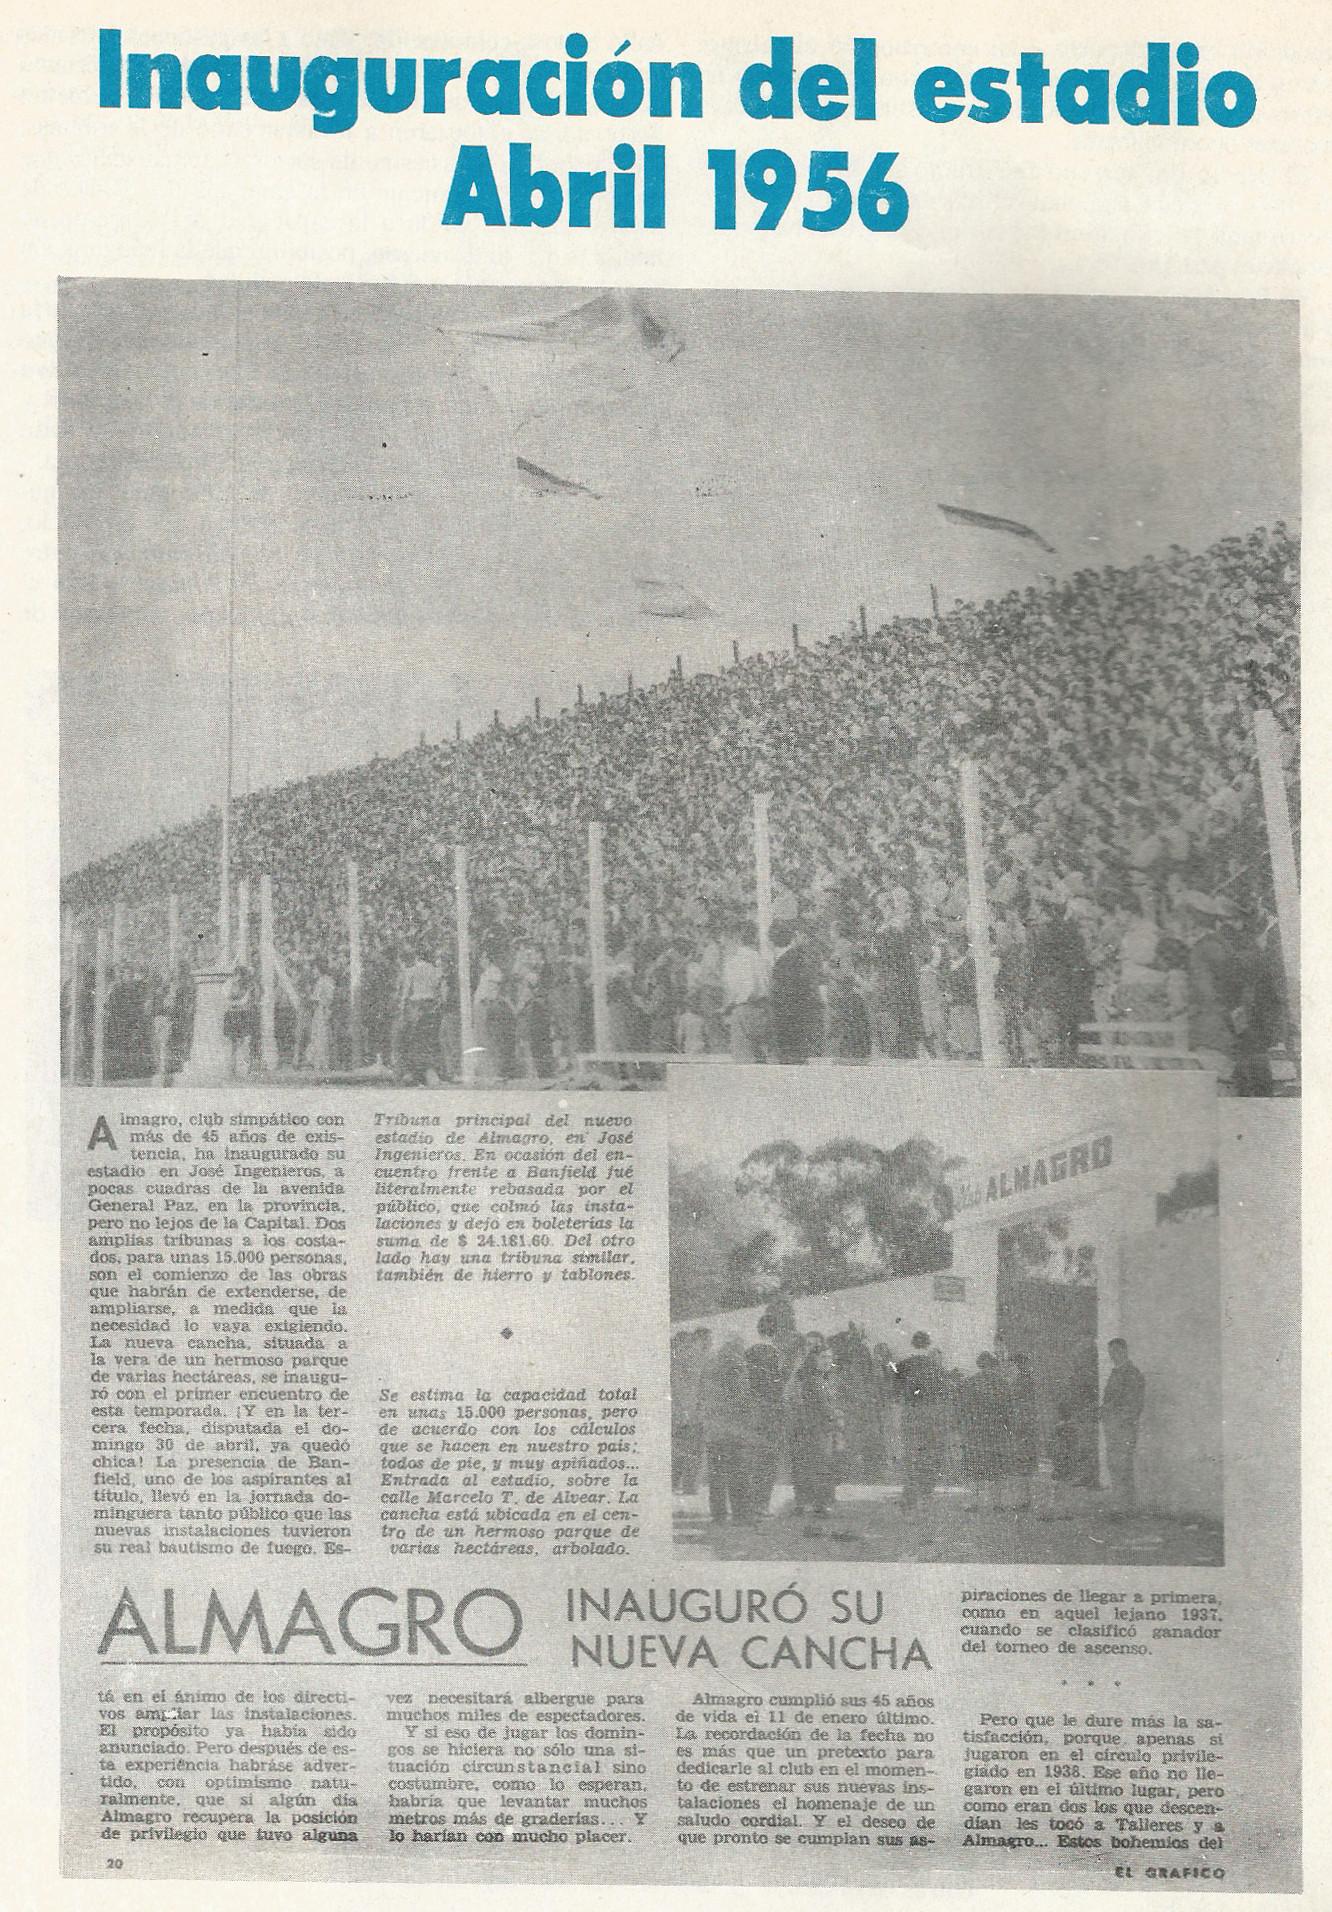 1956 inauguracion estadio